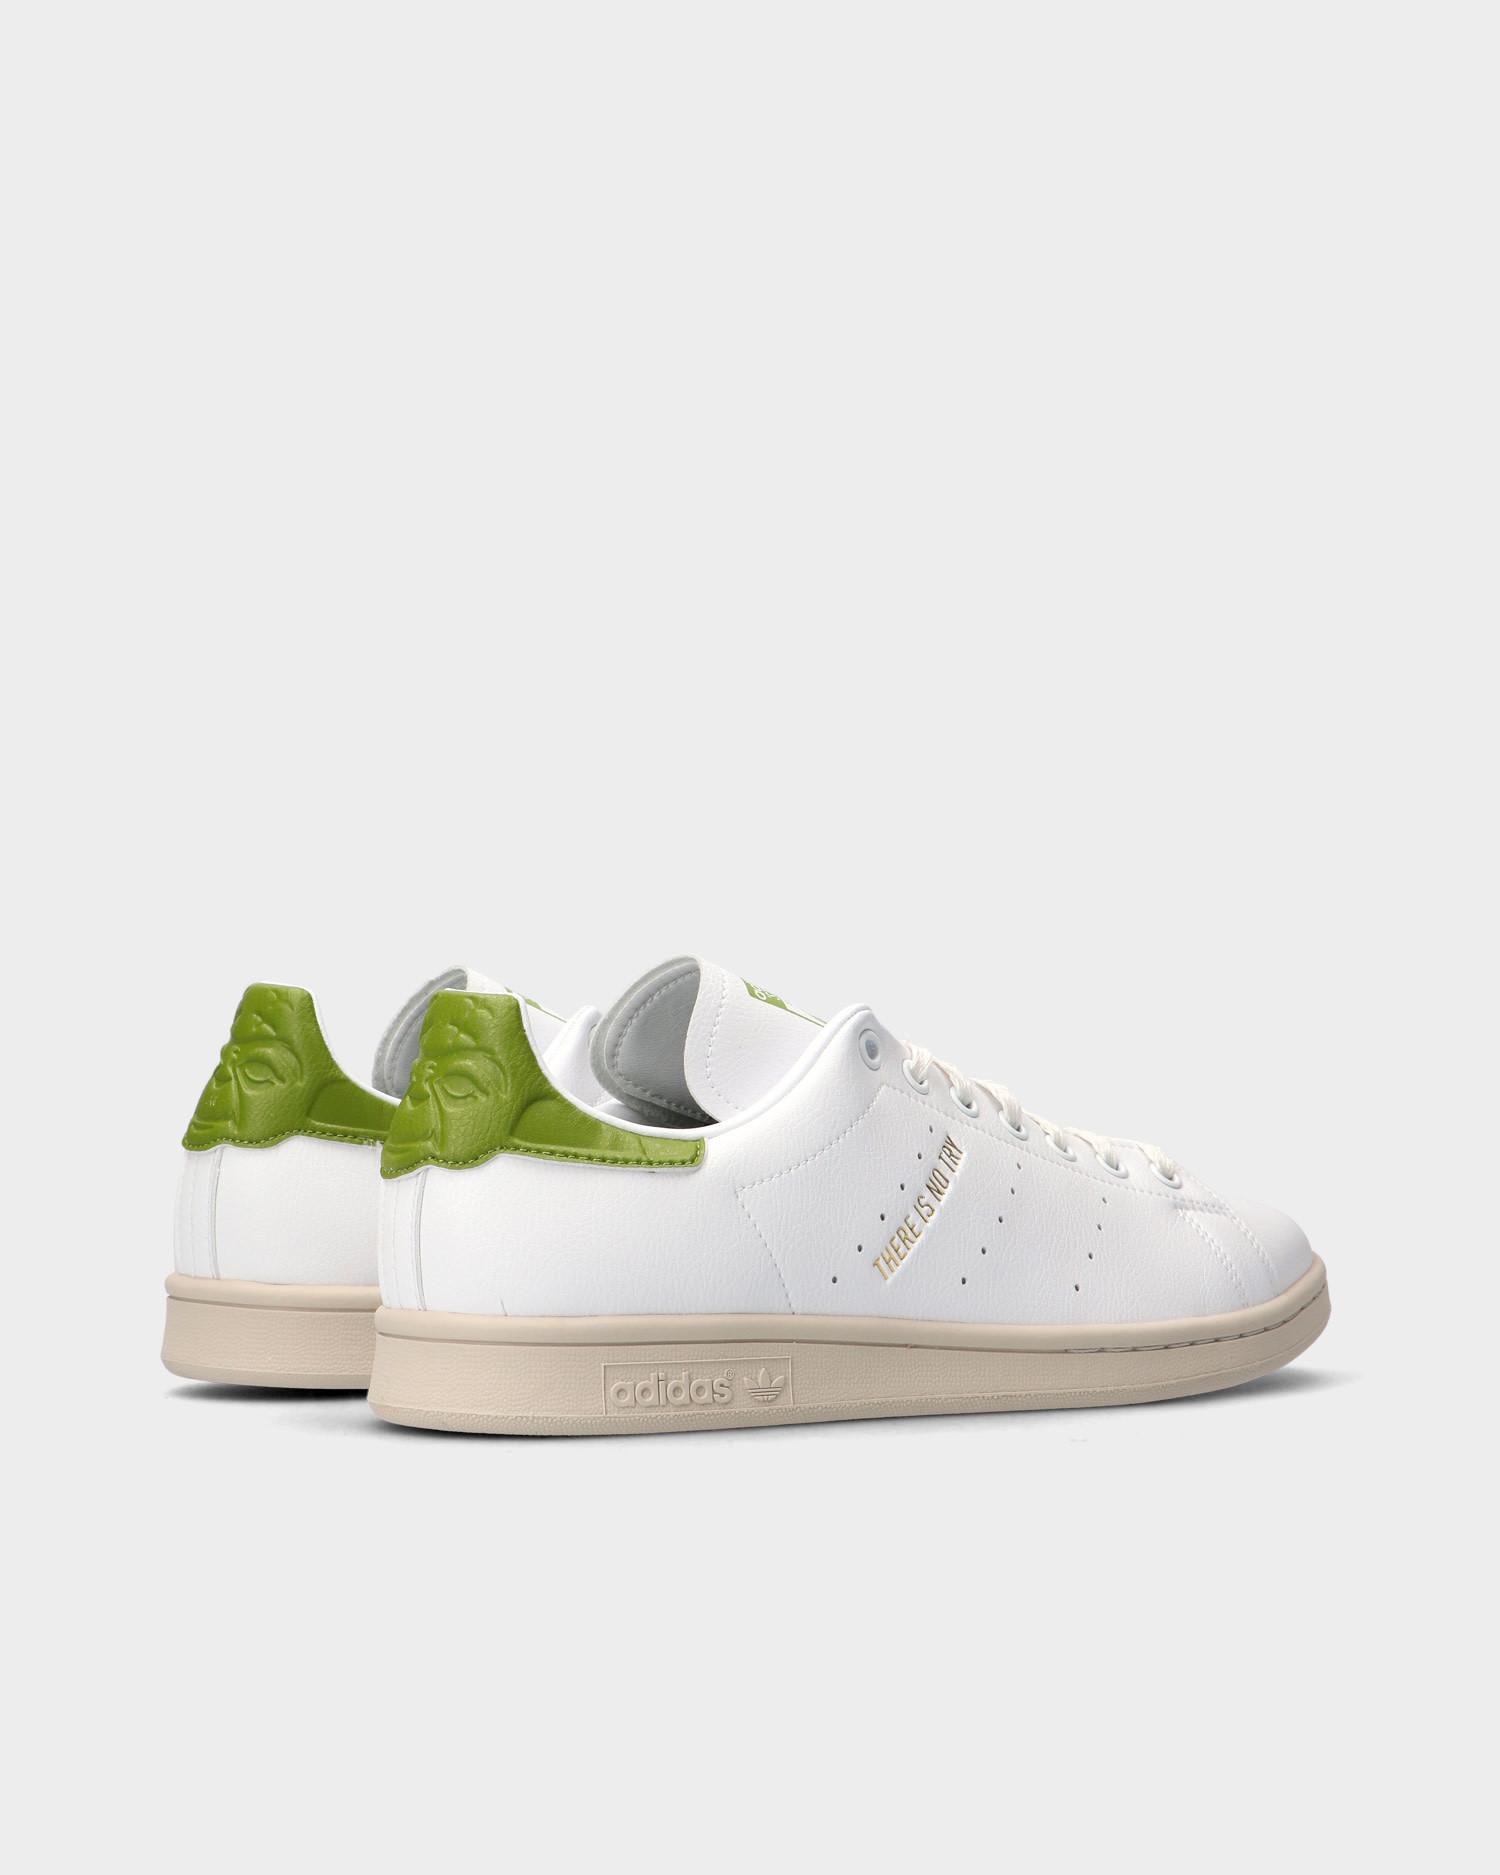 Adidas Stan Smith Yoda Footwear White/Pantone/Clear Brown